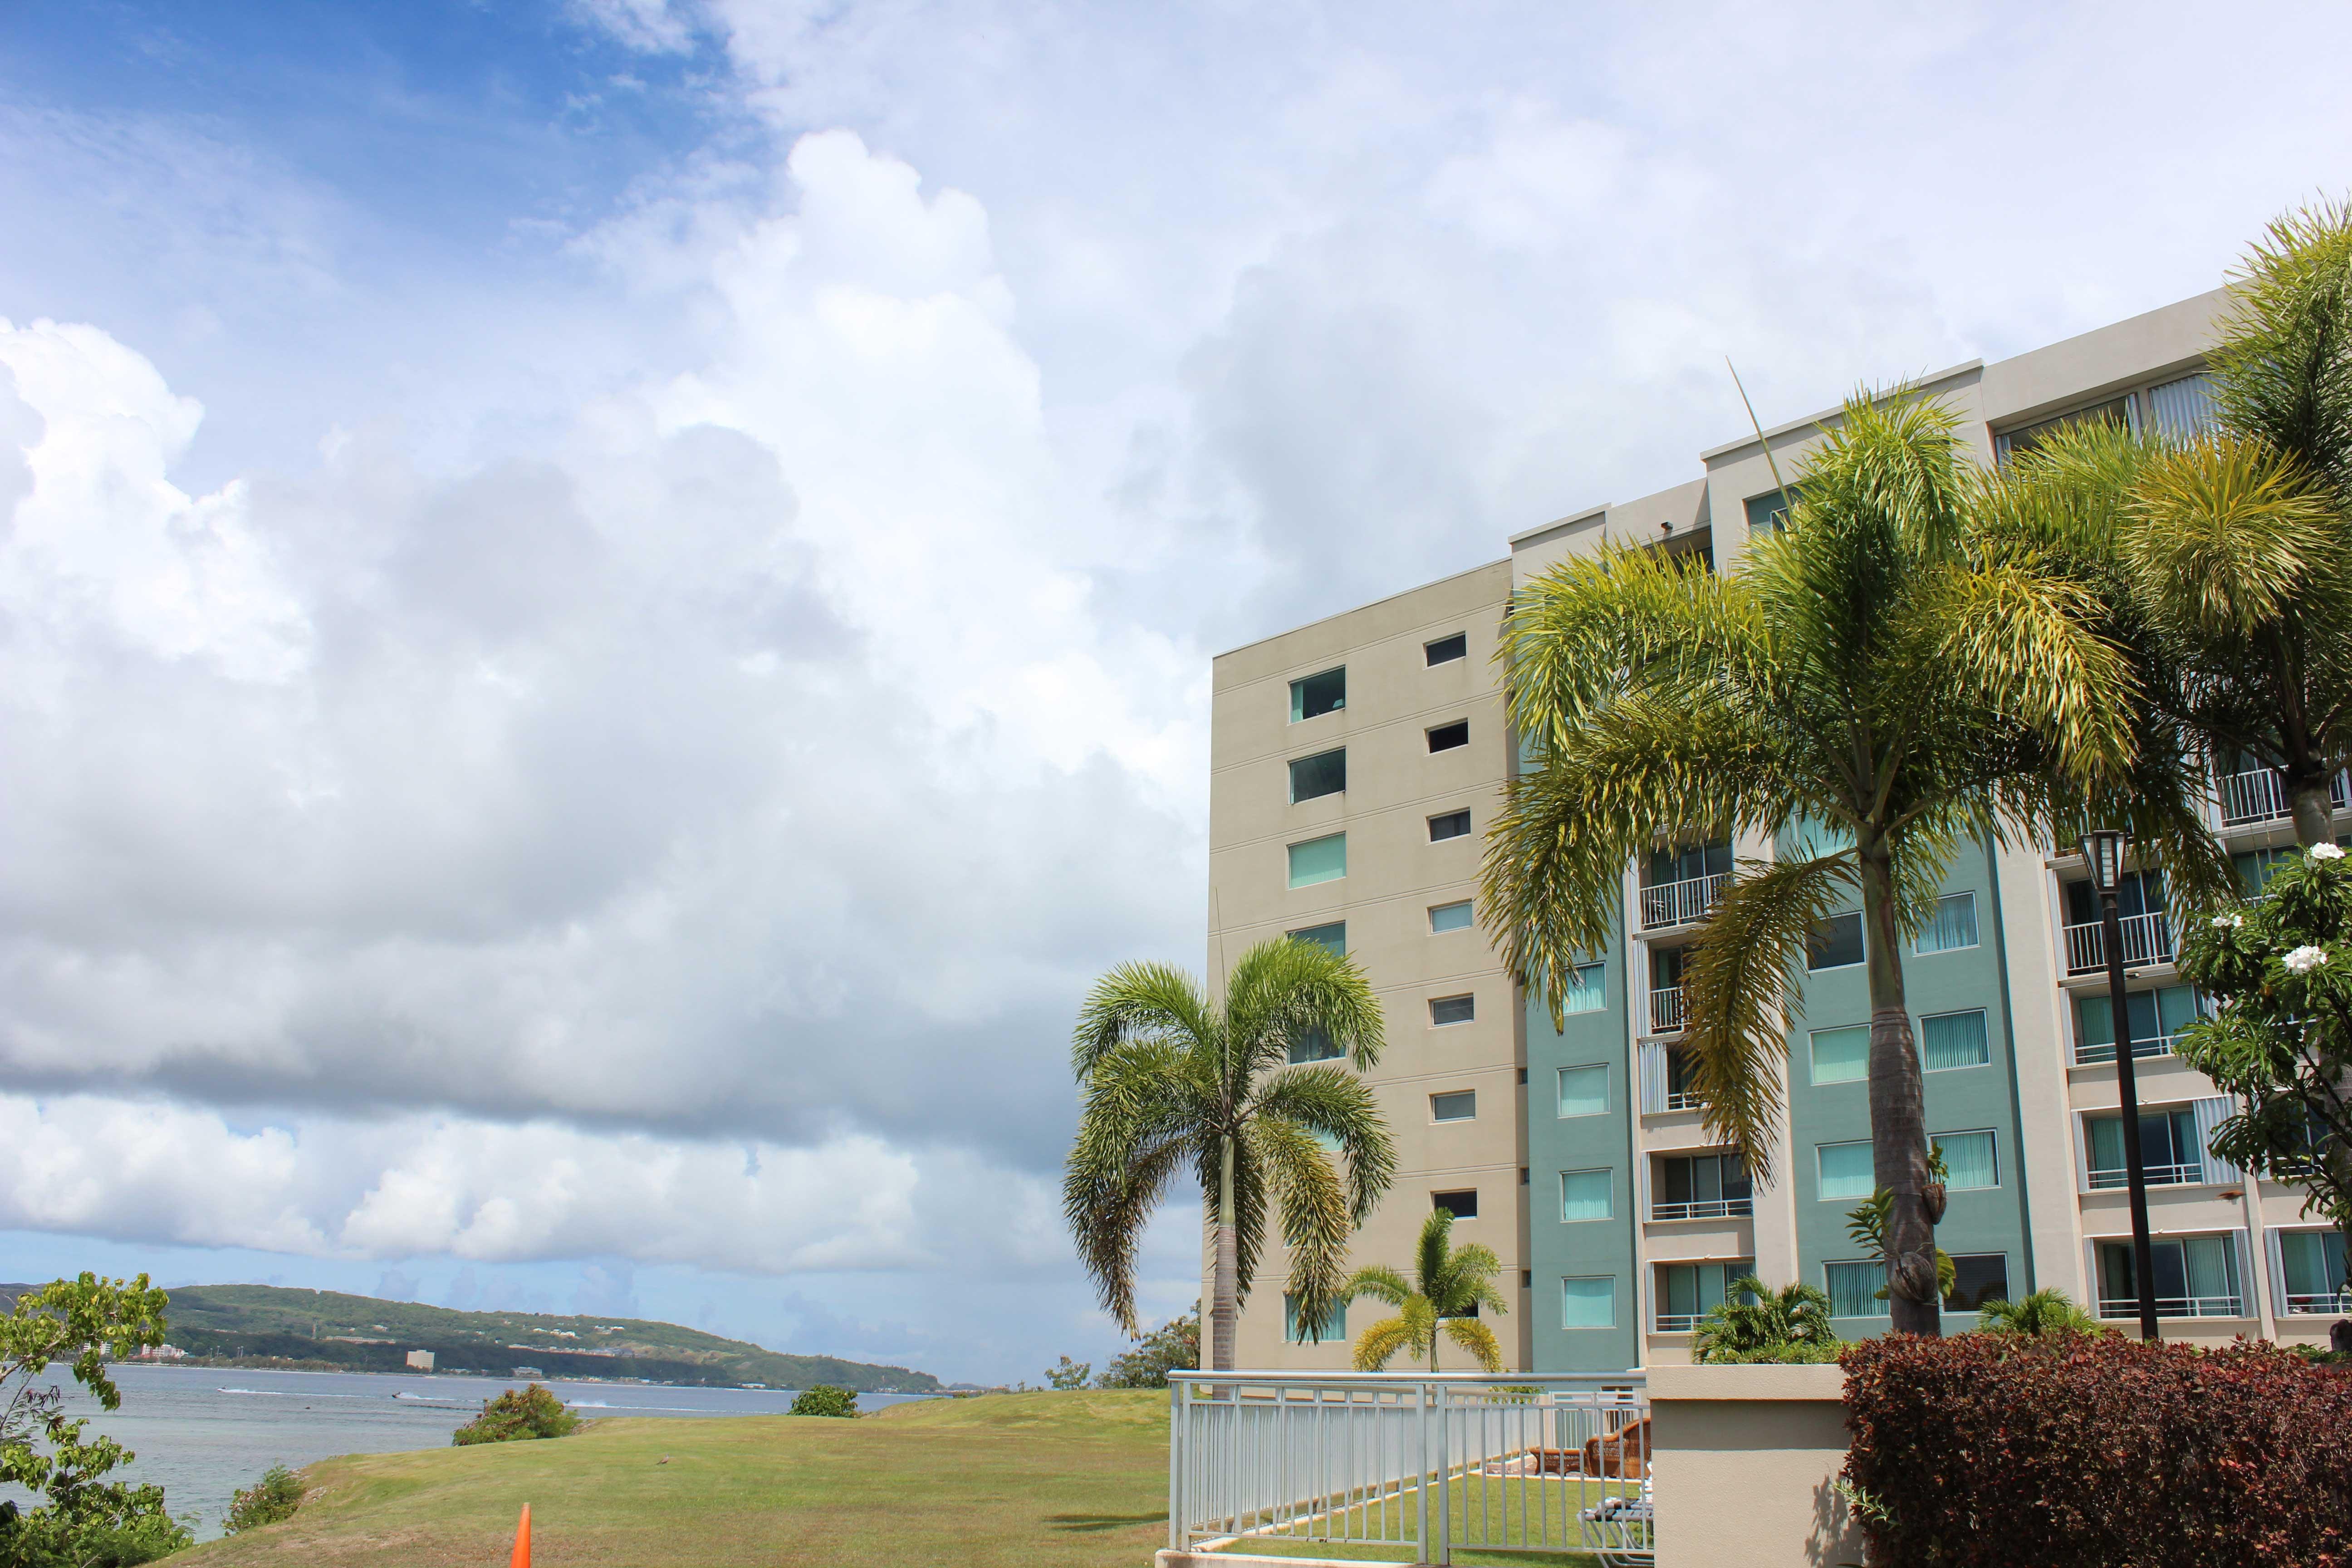 Alupang-Cove-Condo-Guam-View